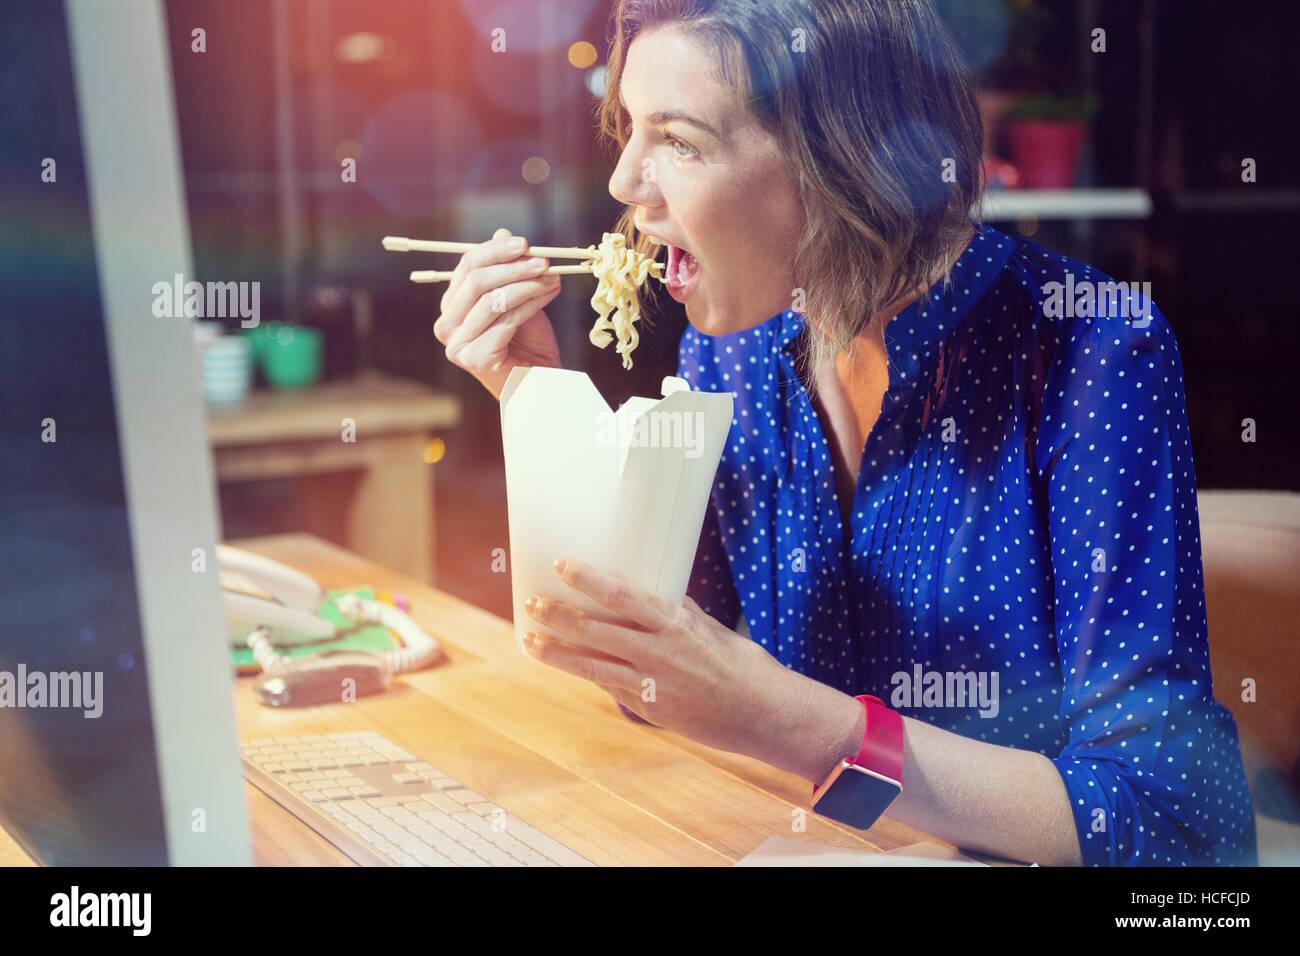 Businesswoman eating noodles at desk - Stock Image